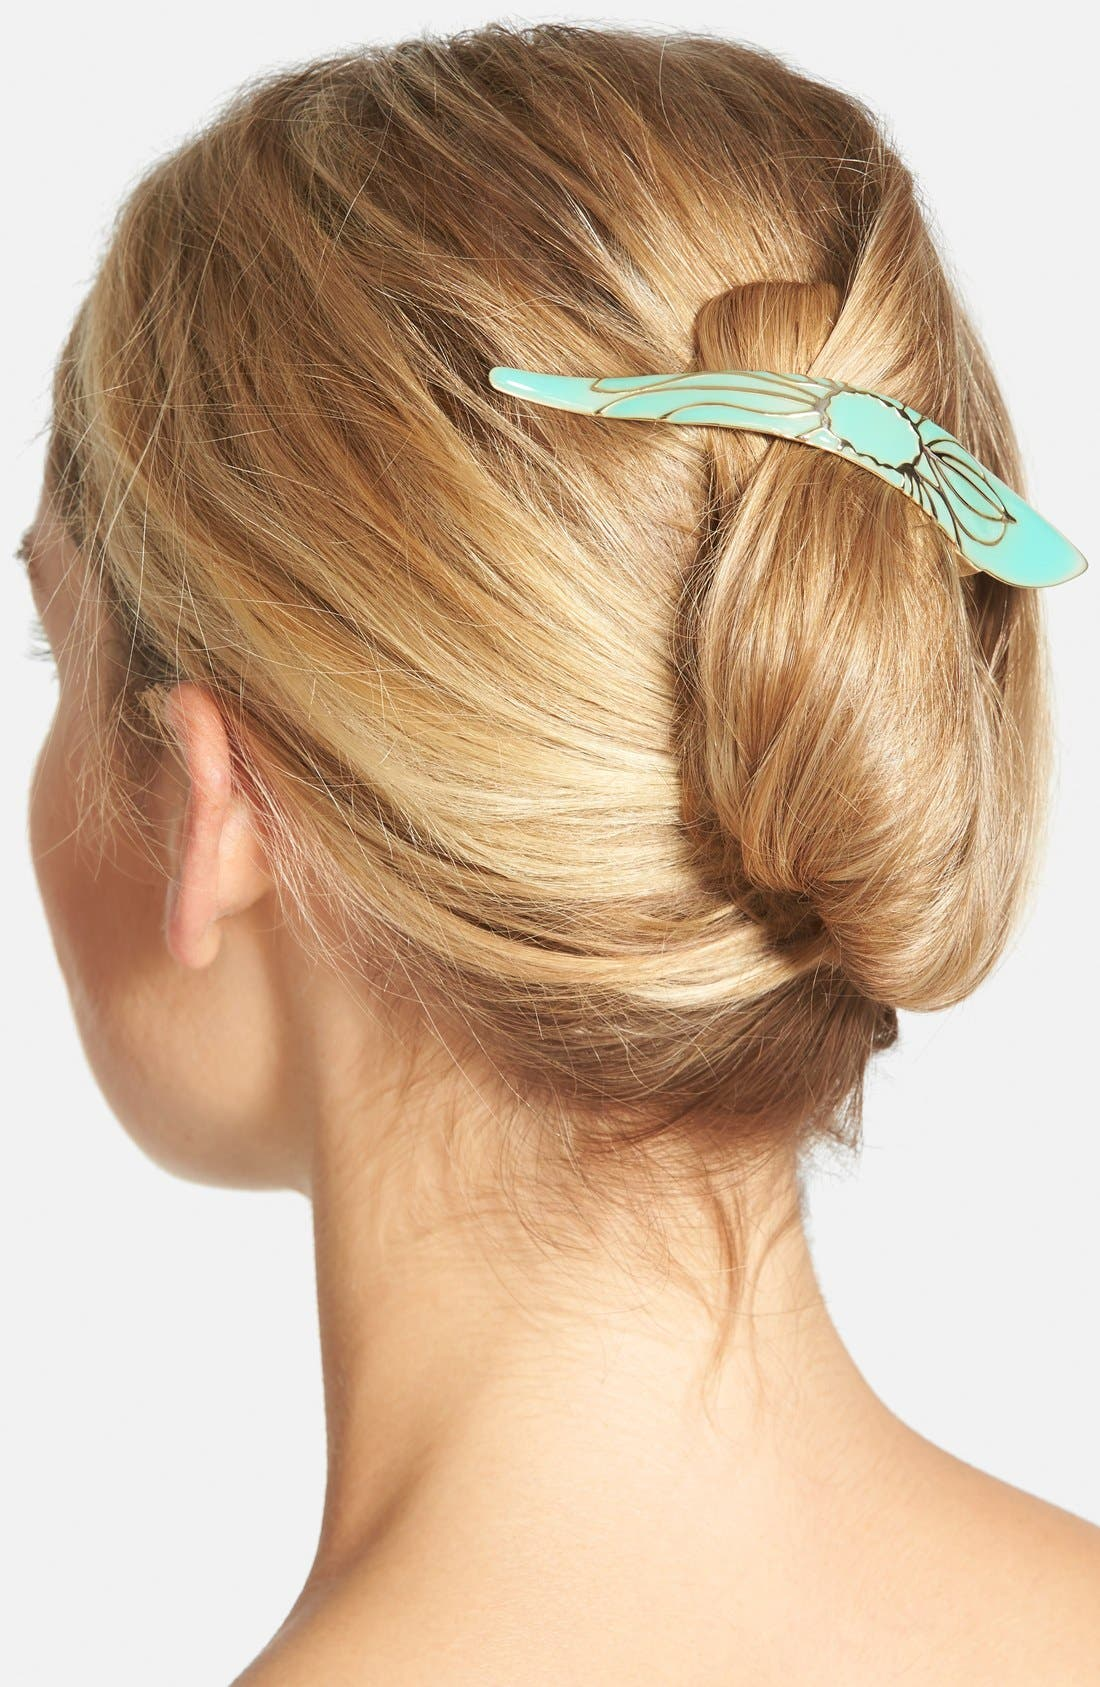 Alternate Image 1 Selected - Ficcare 'Maximus Lotus' Hair Clip